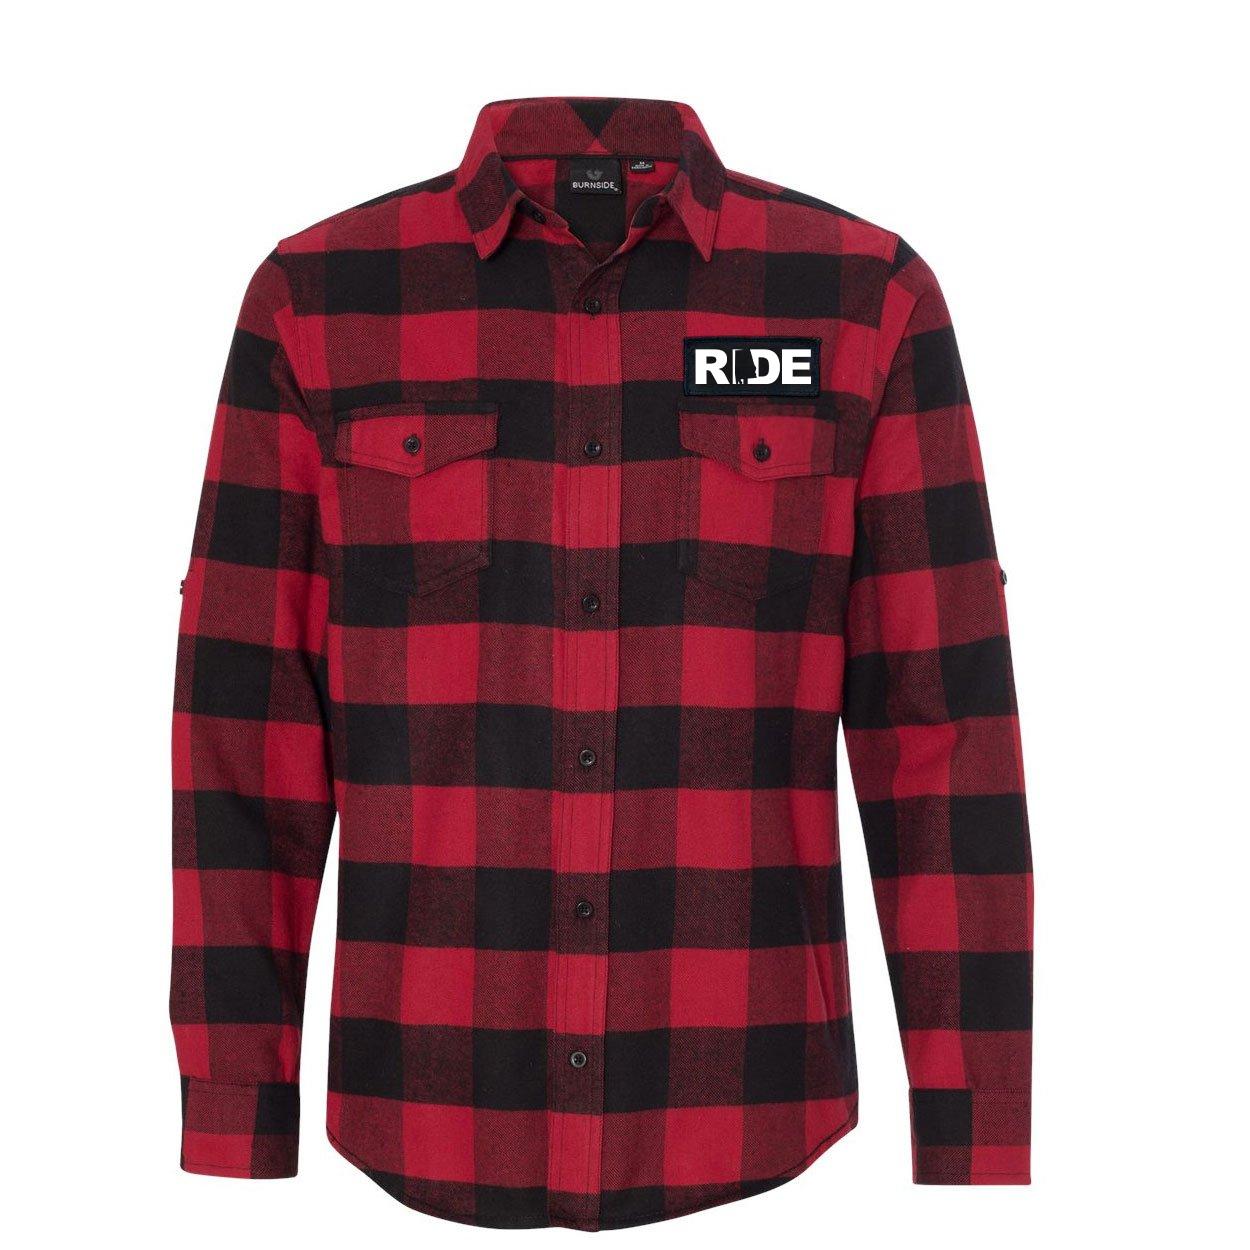 Ride Alabama Classic Unisex Long Sleeve Woven Patch Flannel Shirt Red/Black Buffalo (White Logo)